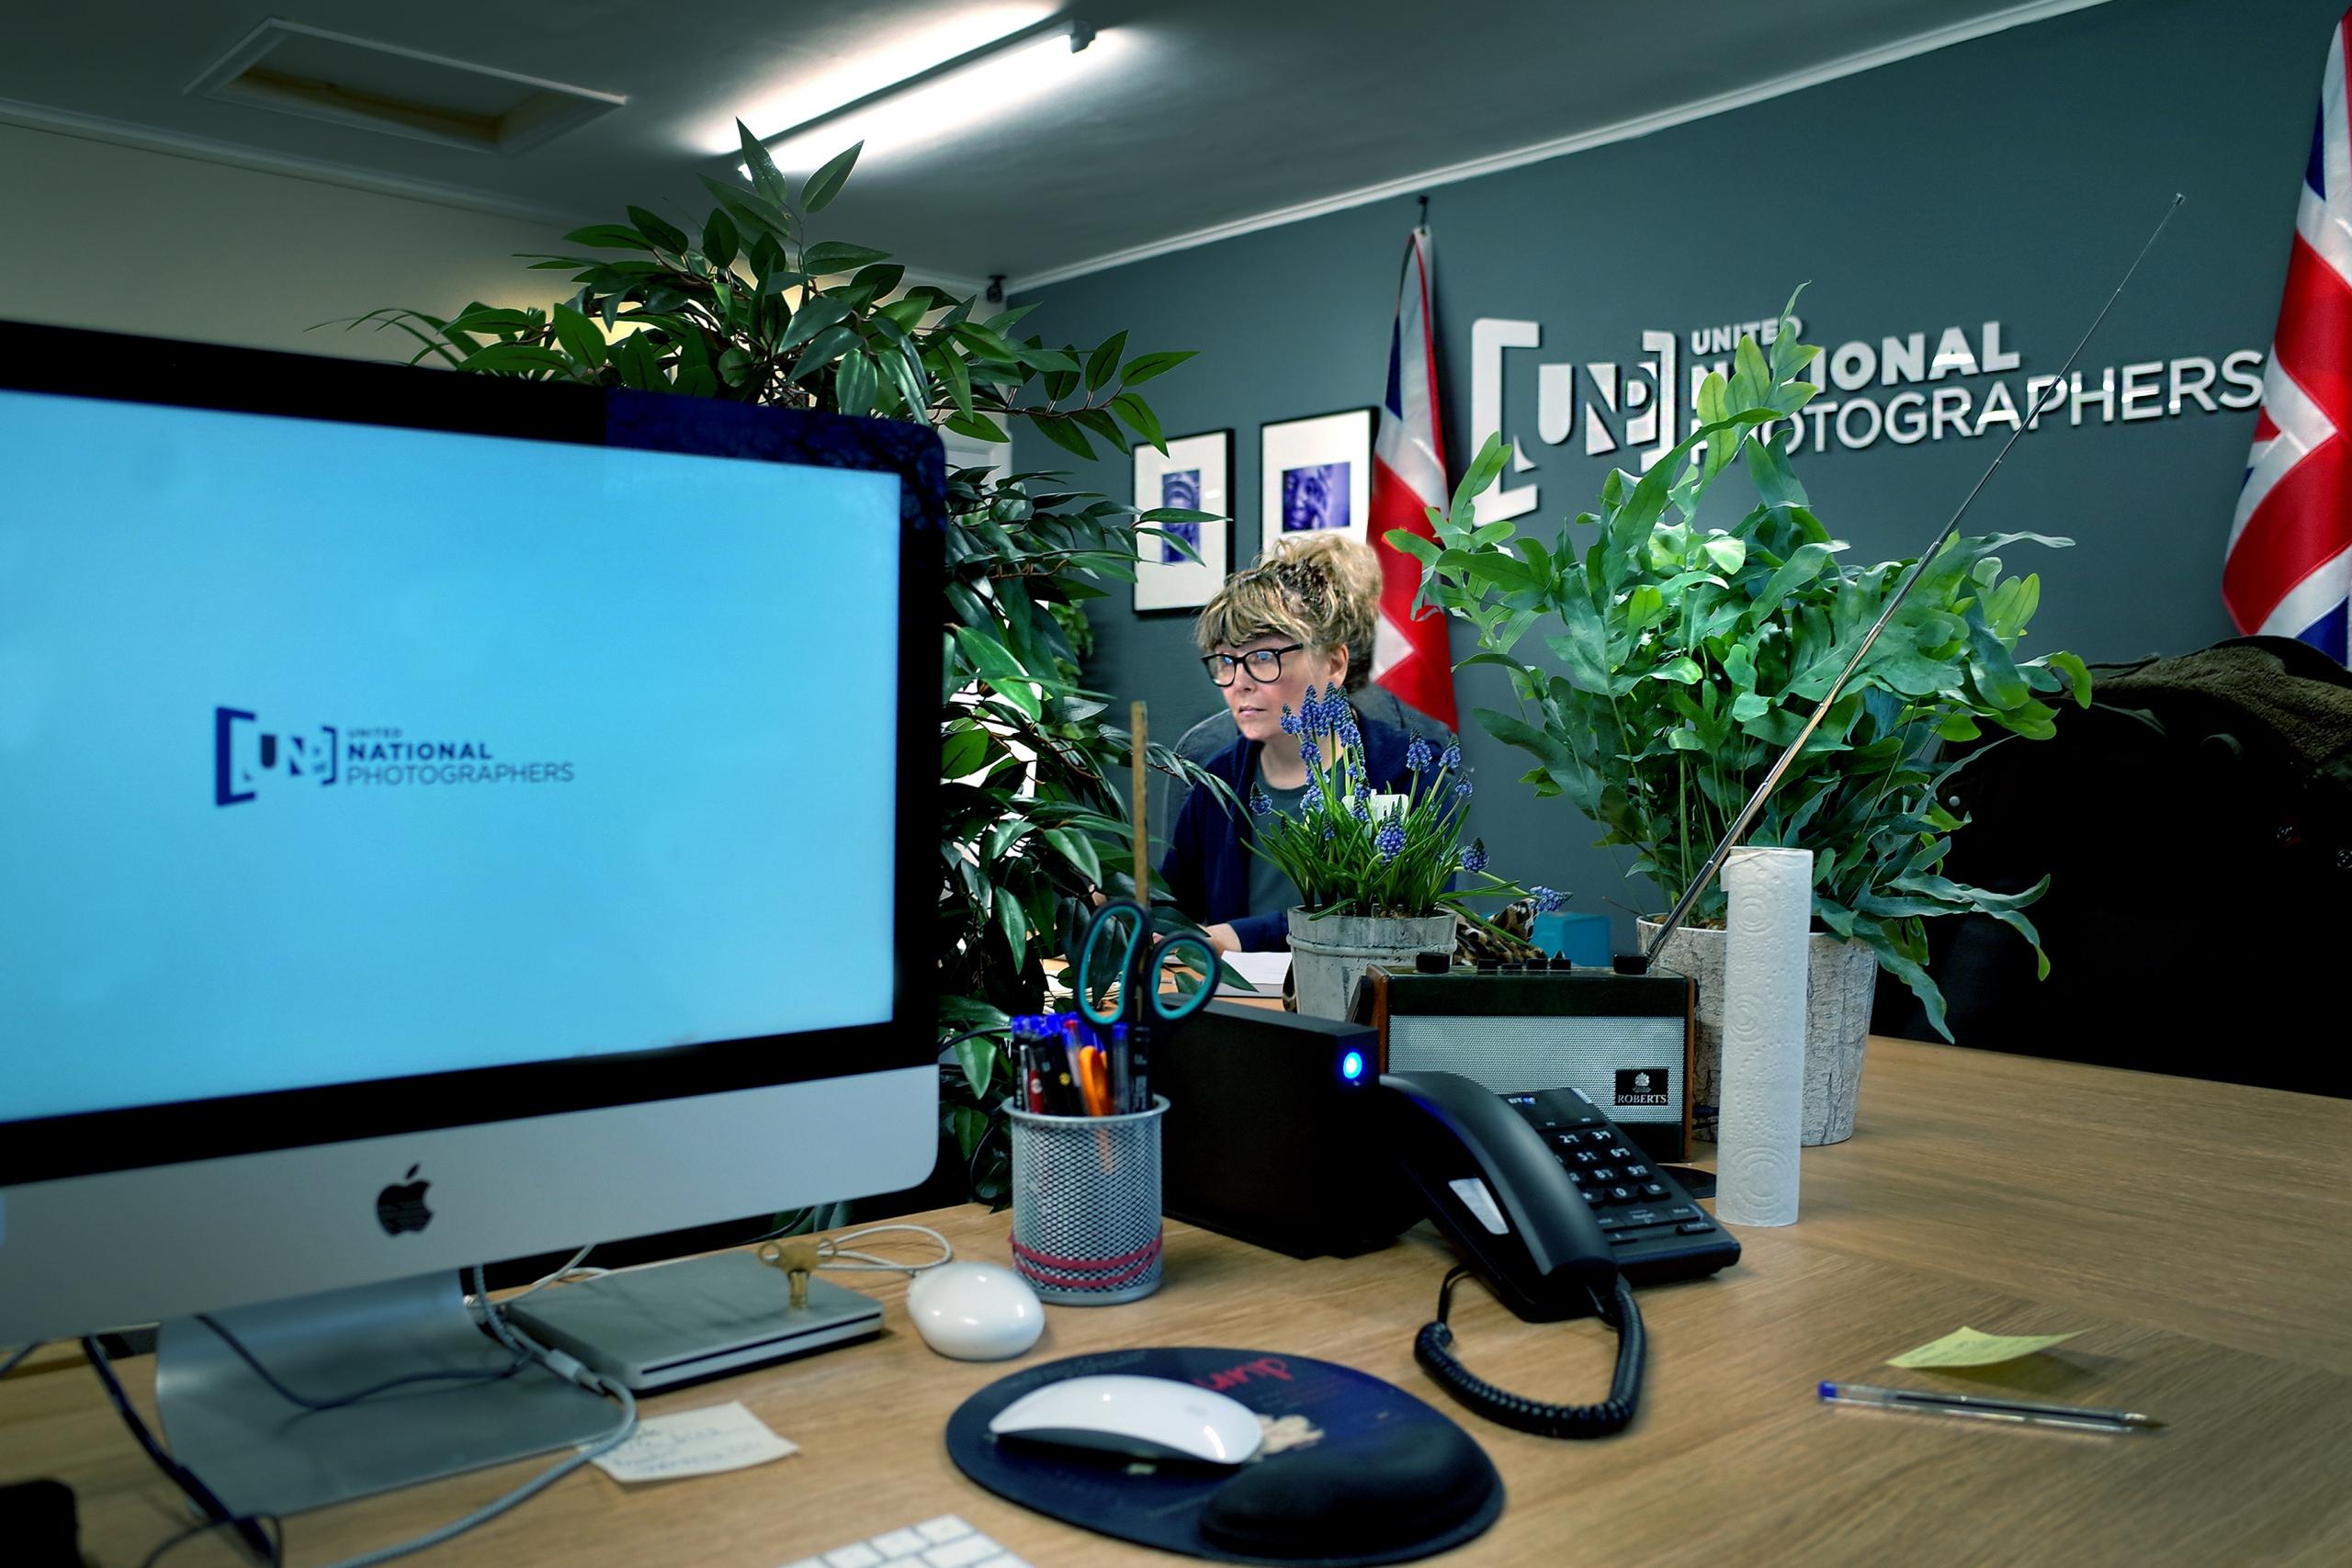 UNP Photo Agency Office